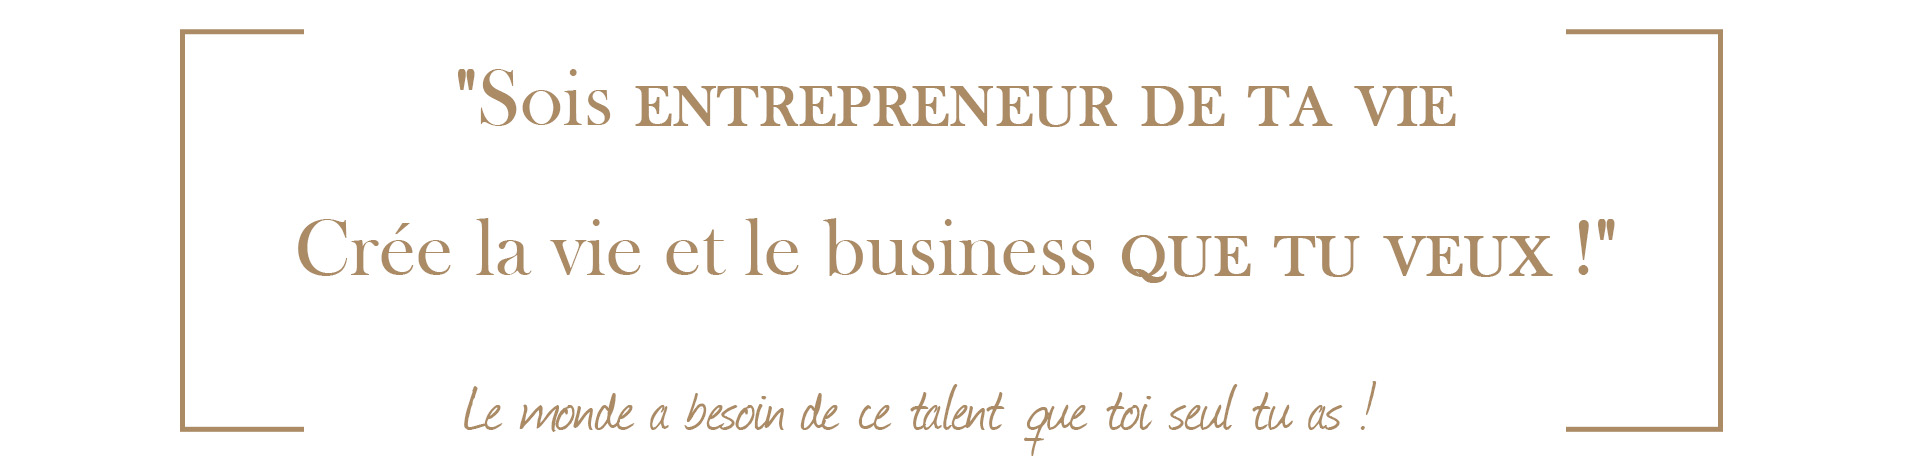 Sois entrepreneur de ta vie